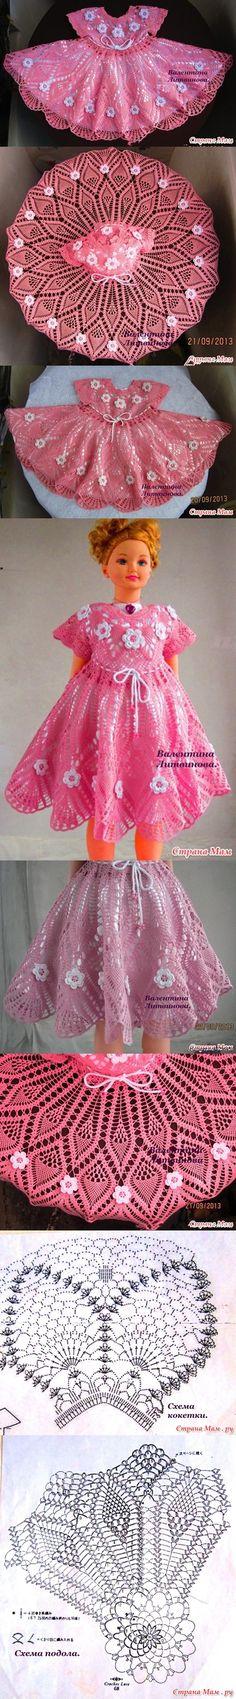 crochet princess dress pattern